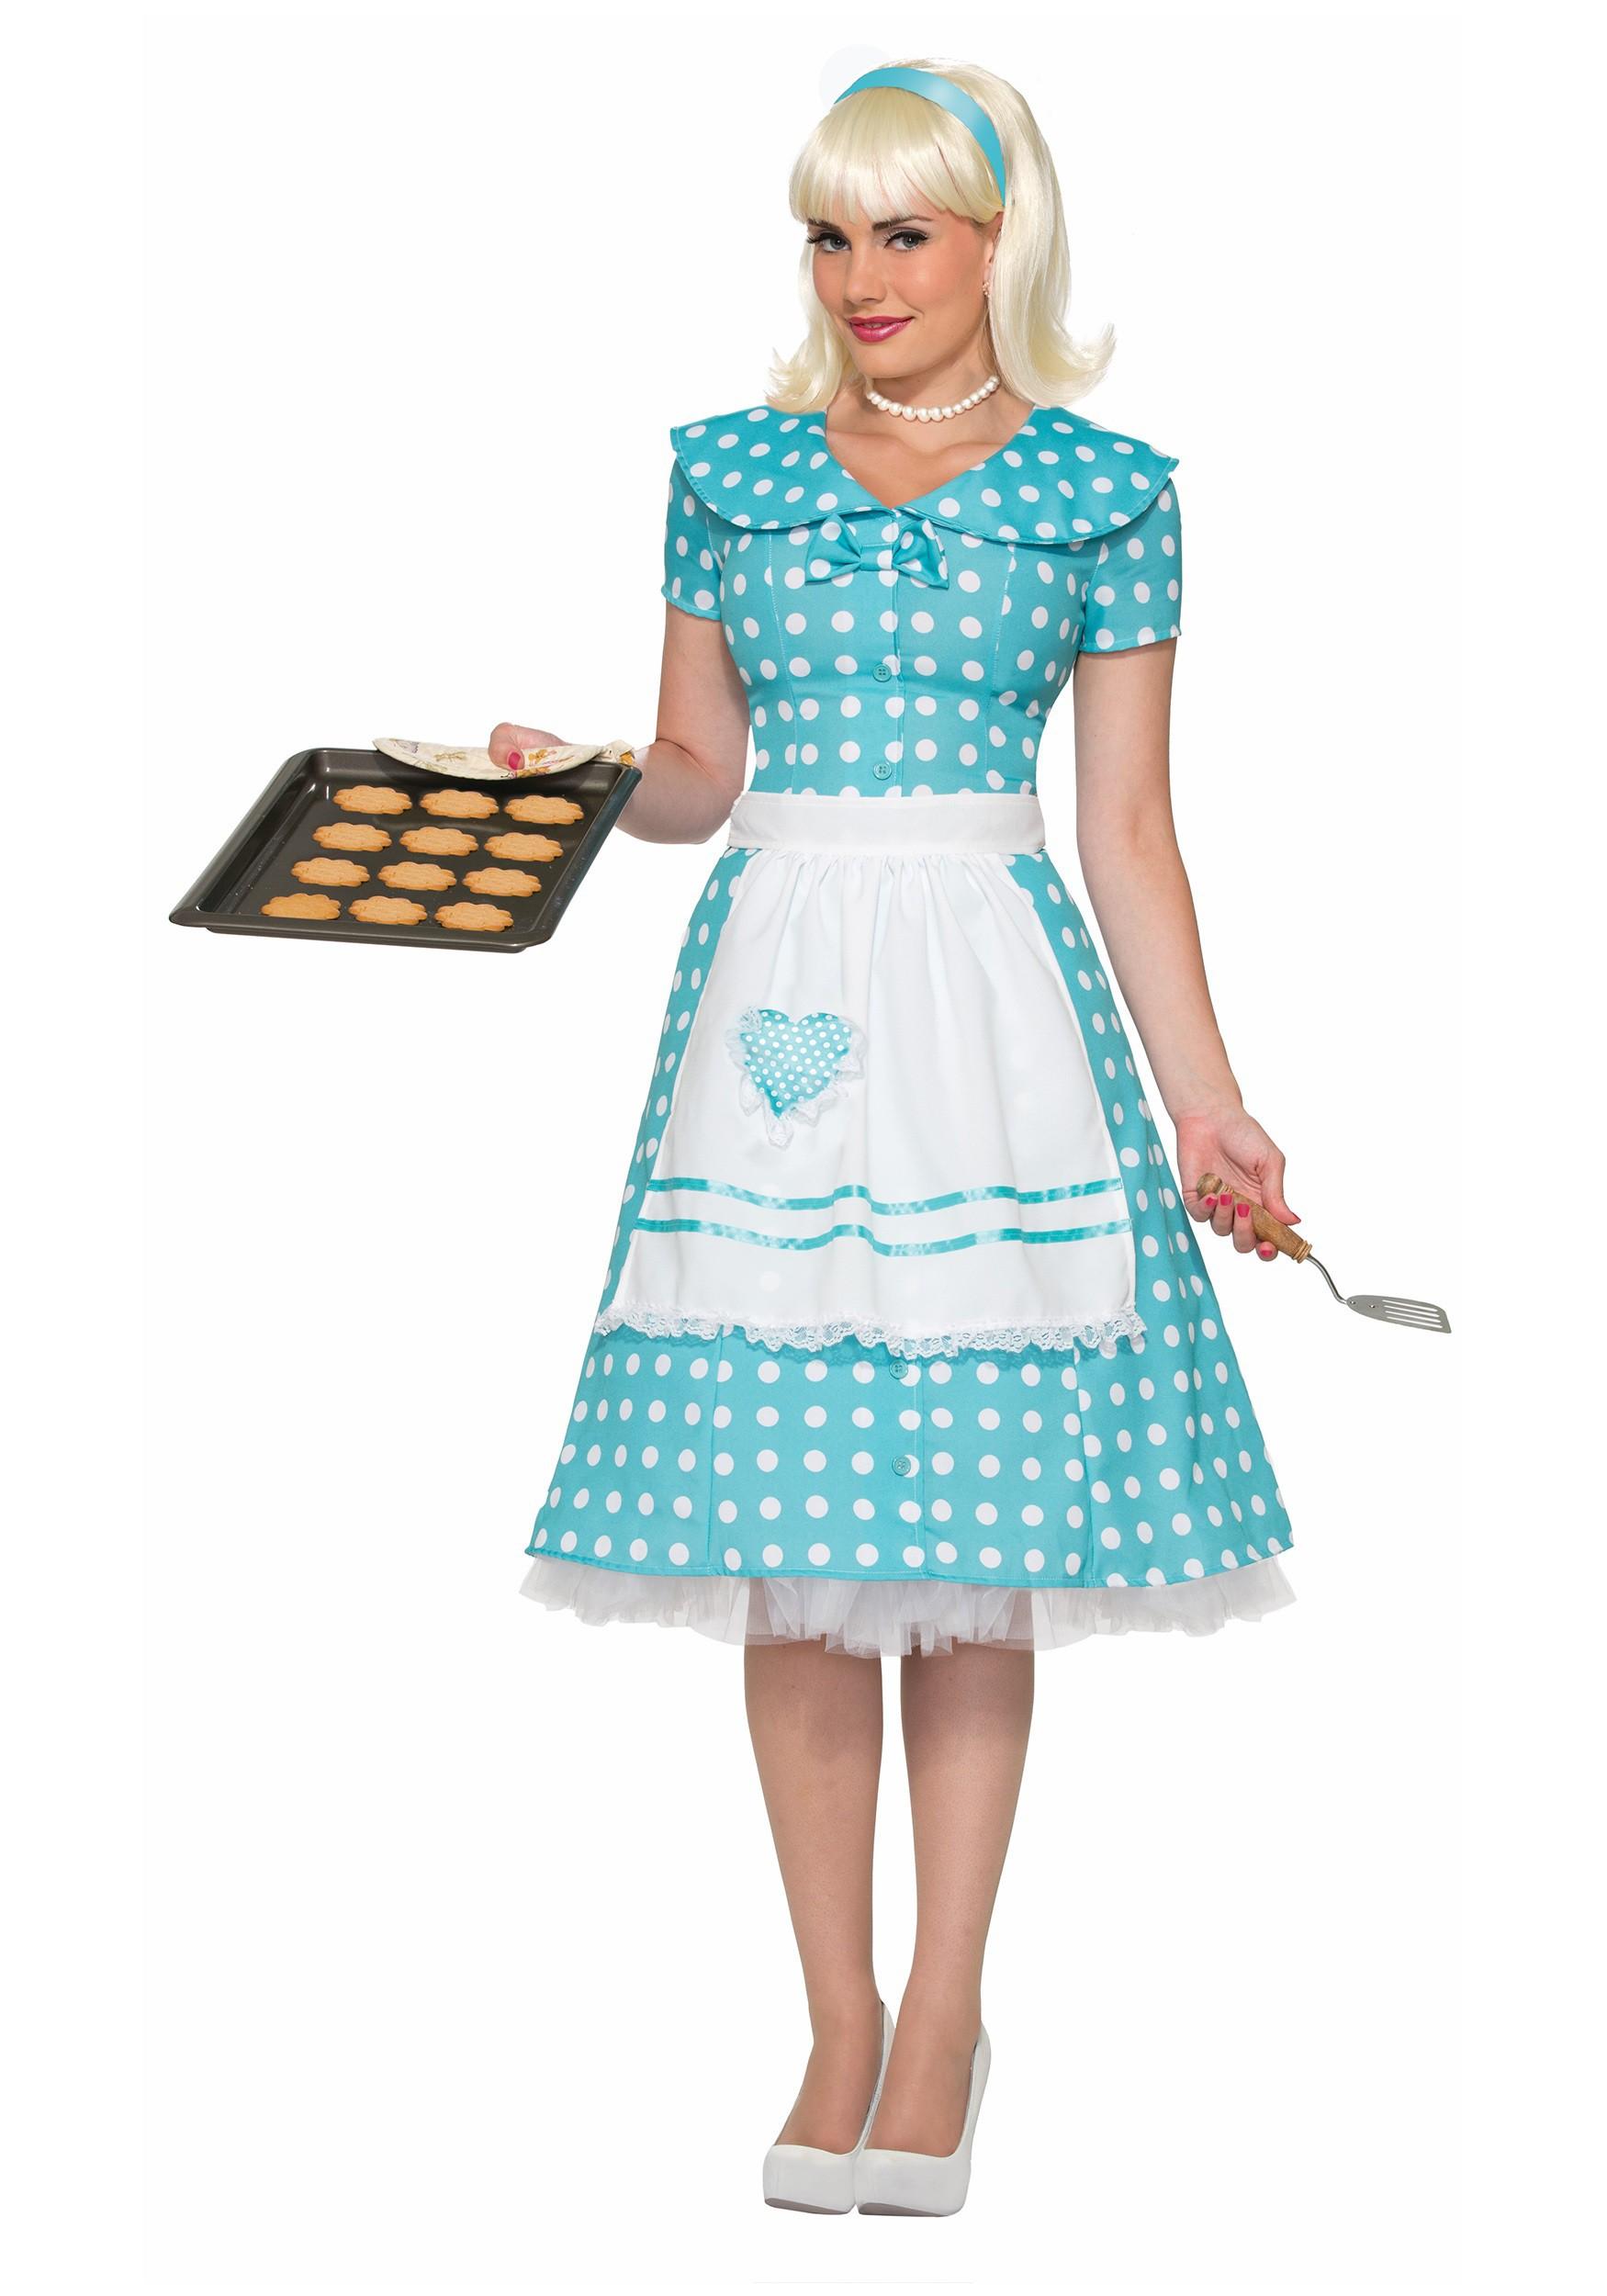 50s Costumes & Sock Hop Outfits - HalloweenCostumes.com